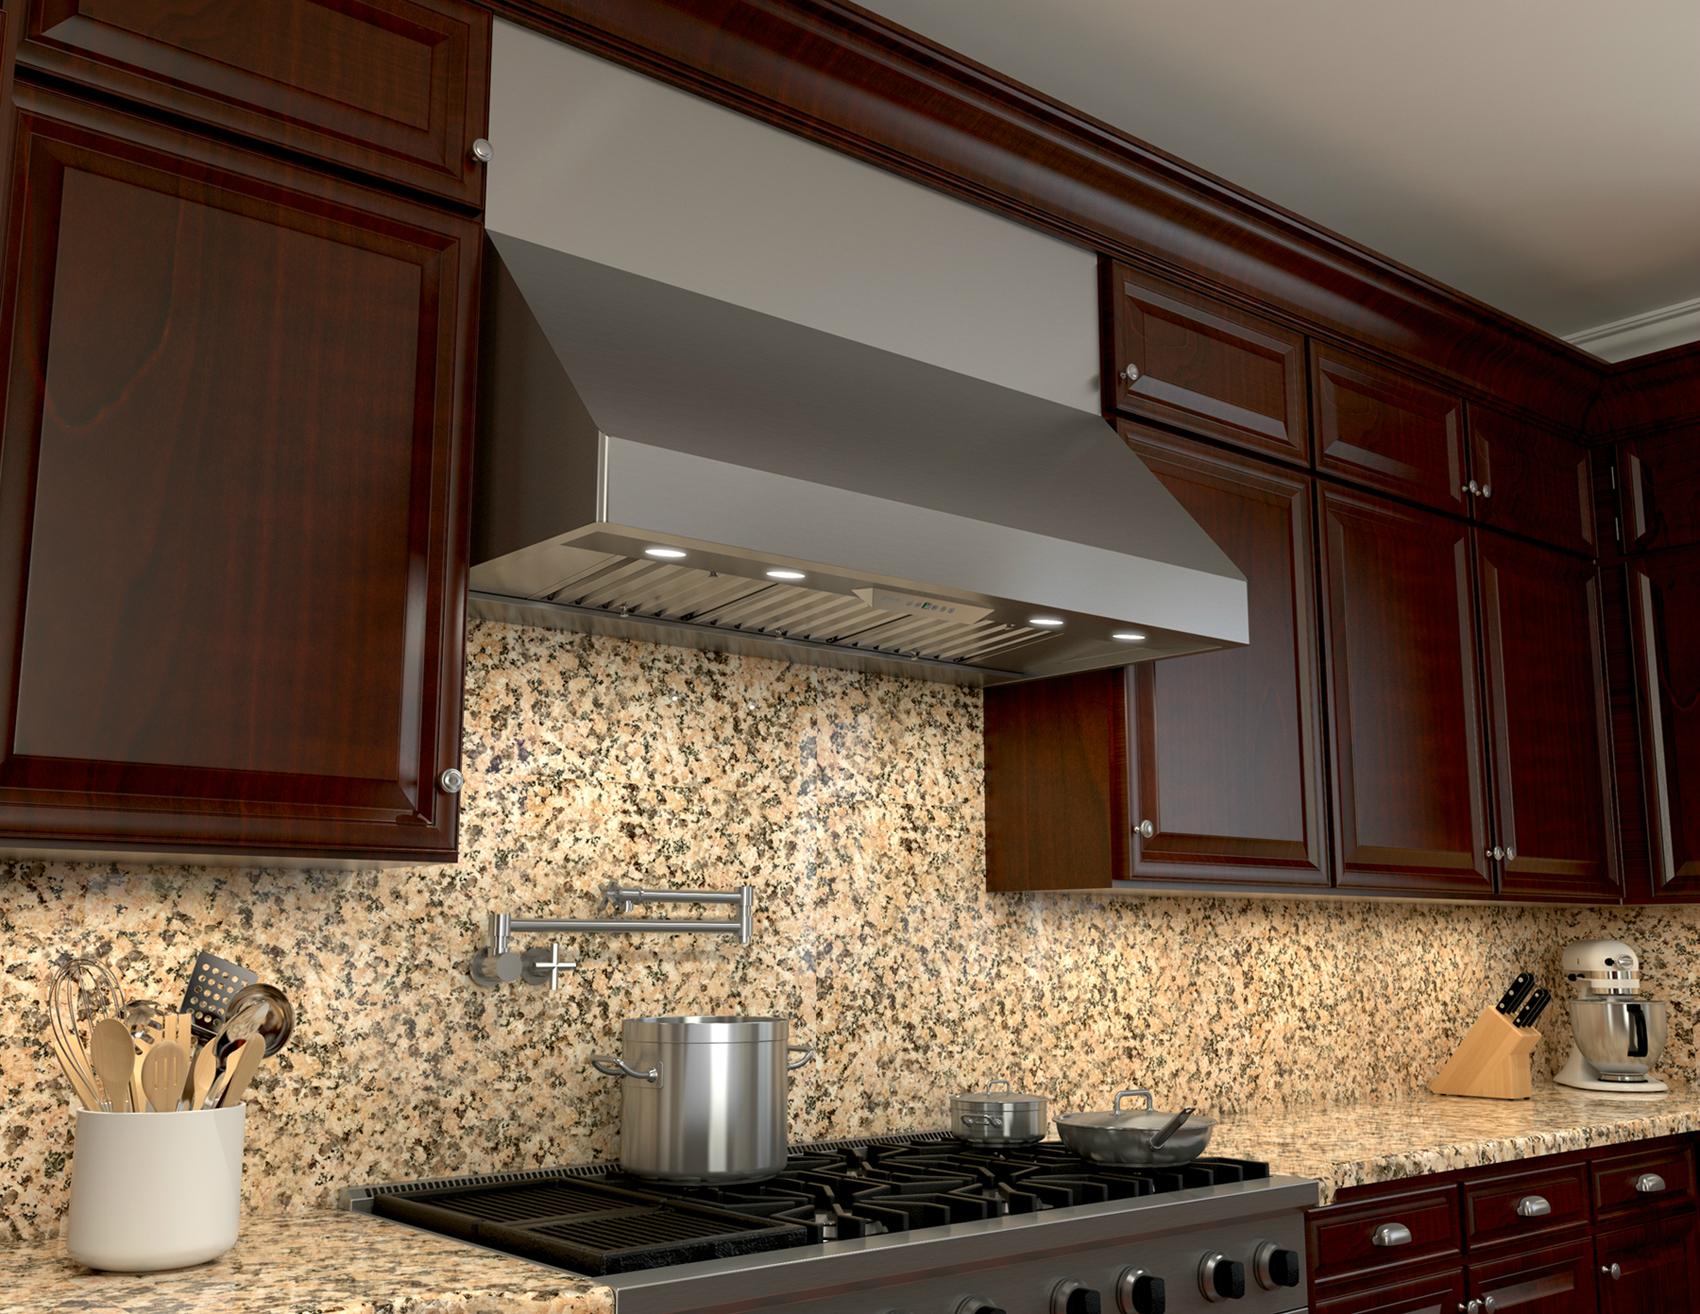 presenza ductless wood decoration cabinet hoods zephyr chimney classy vent kitchen hood under range ideas decor glass island comfy natural for